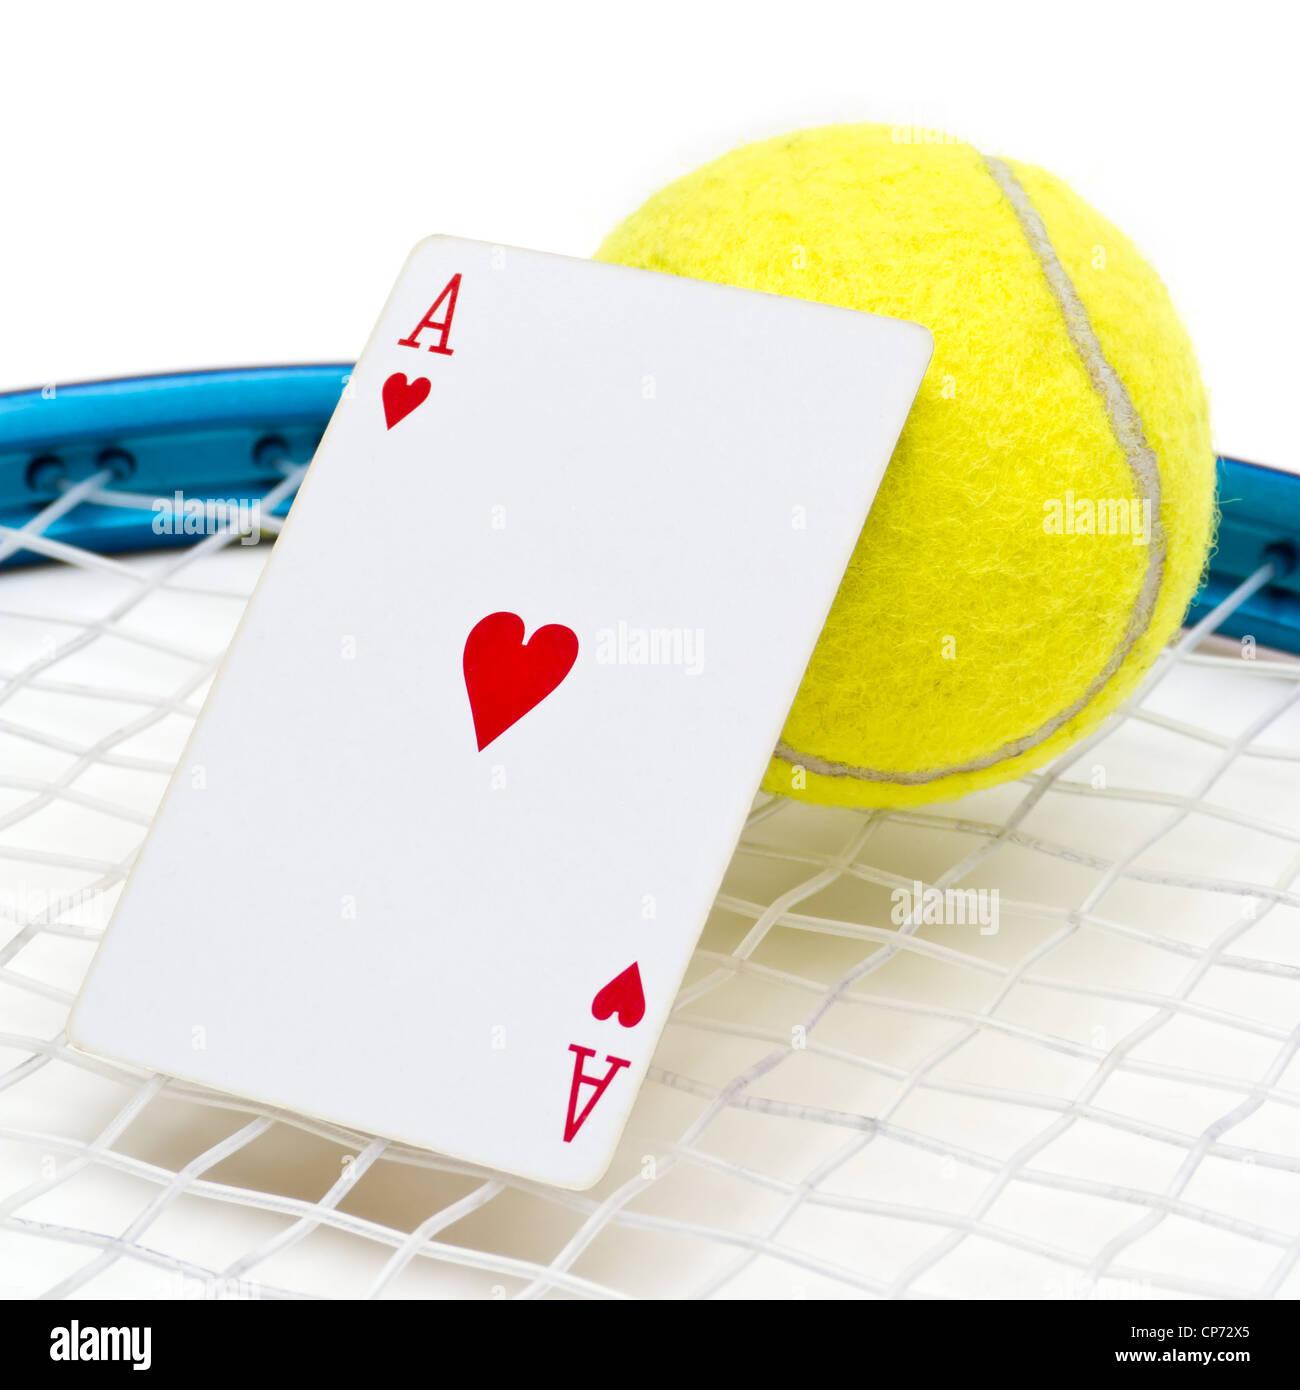 Tennis Ace - Stock Image